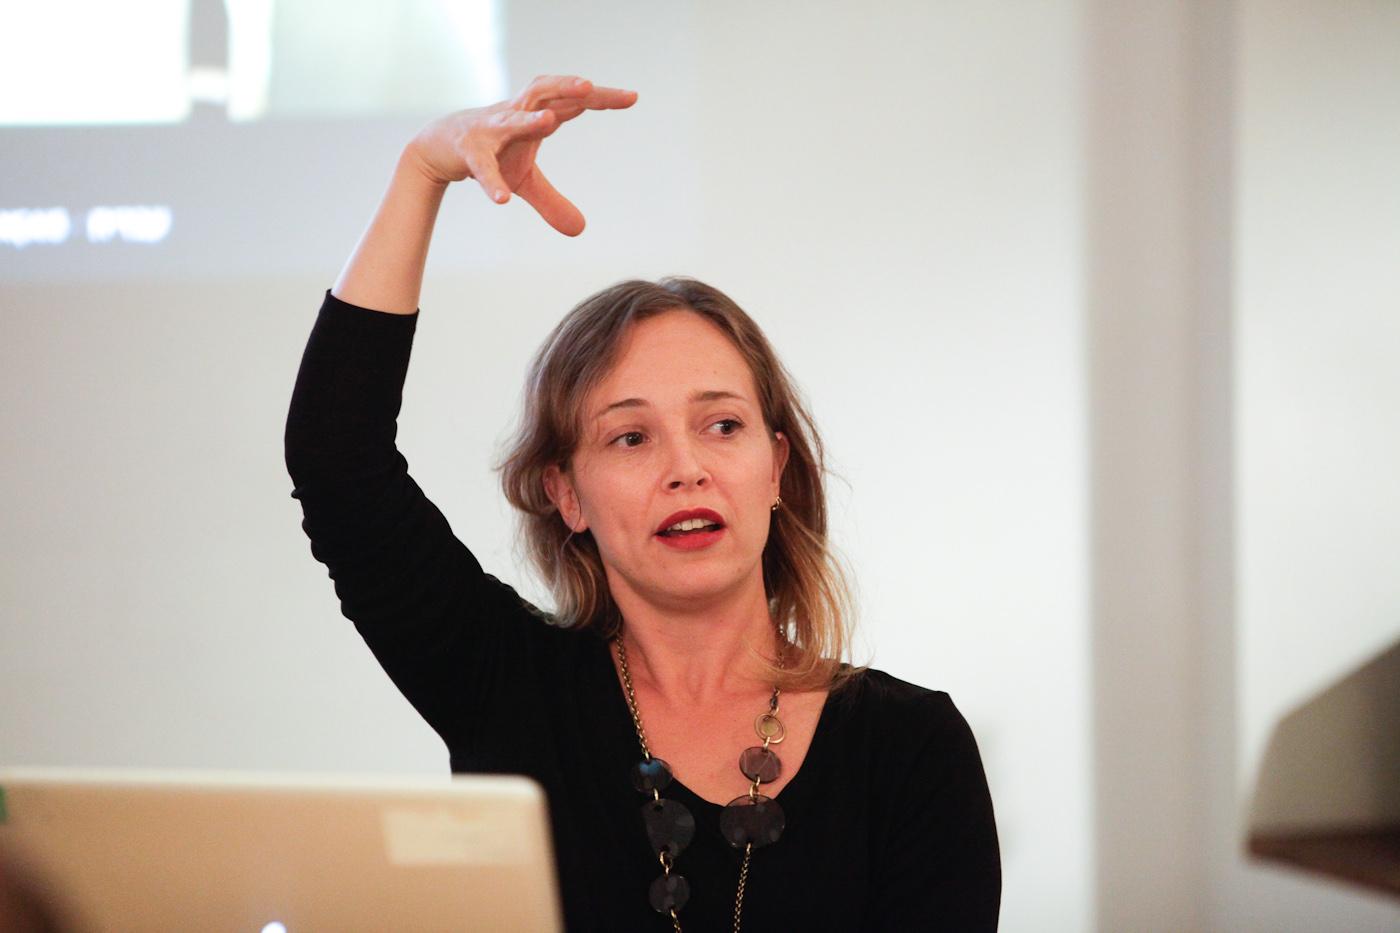 Maya Eriksson